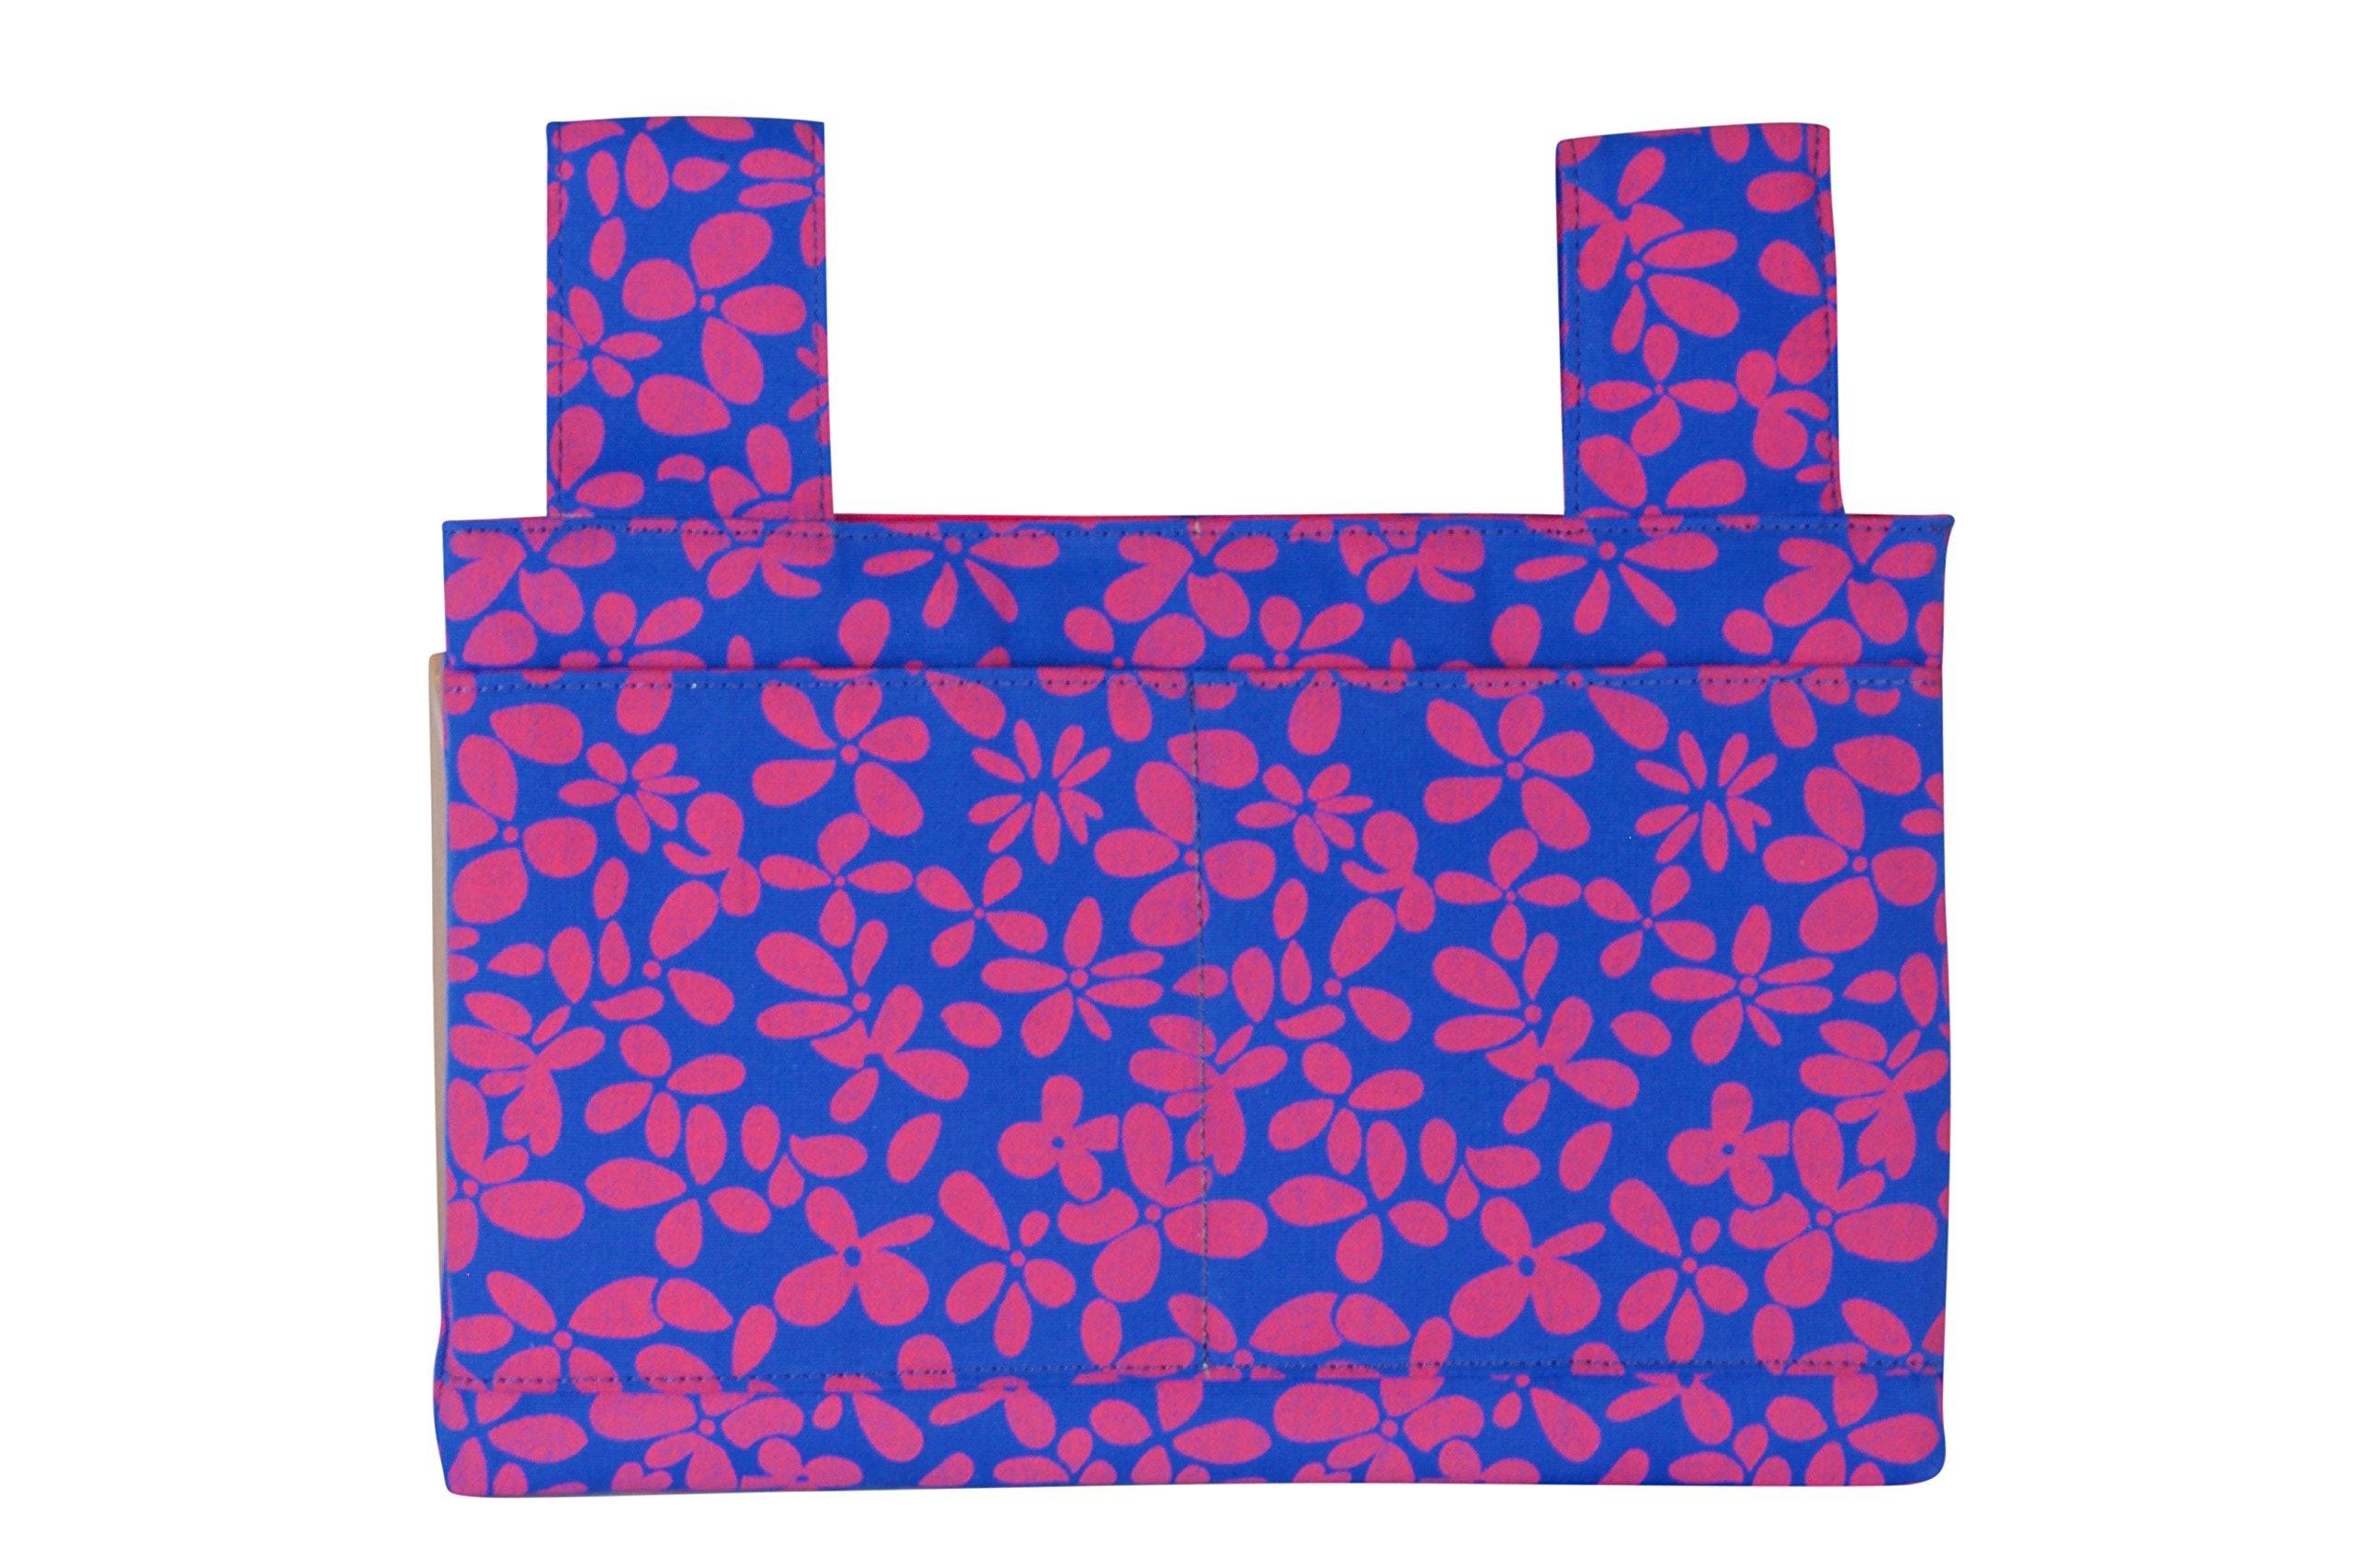 Qelse Designer Walker Bag 3-Pocket Tote Organizer Pouch ROYAL BLUE FLORAL Accessories for Beautiful Mobility